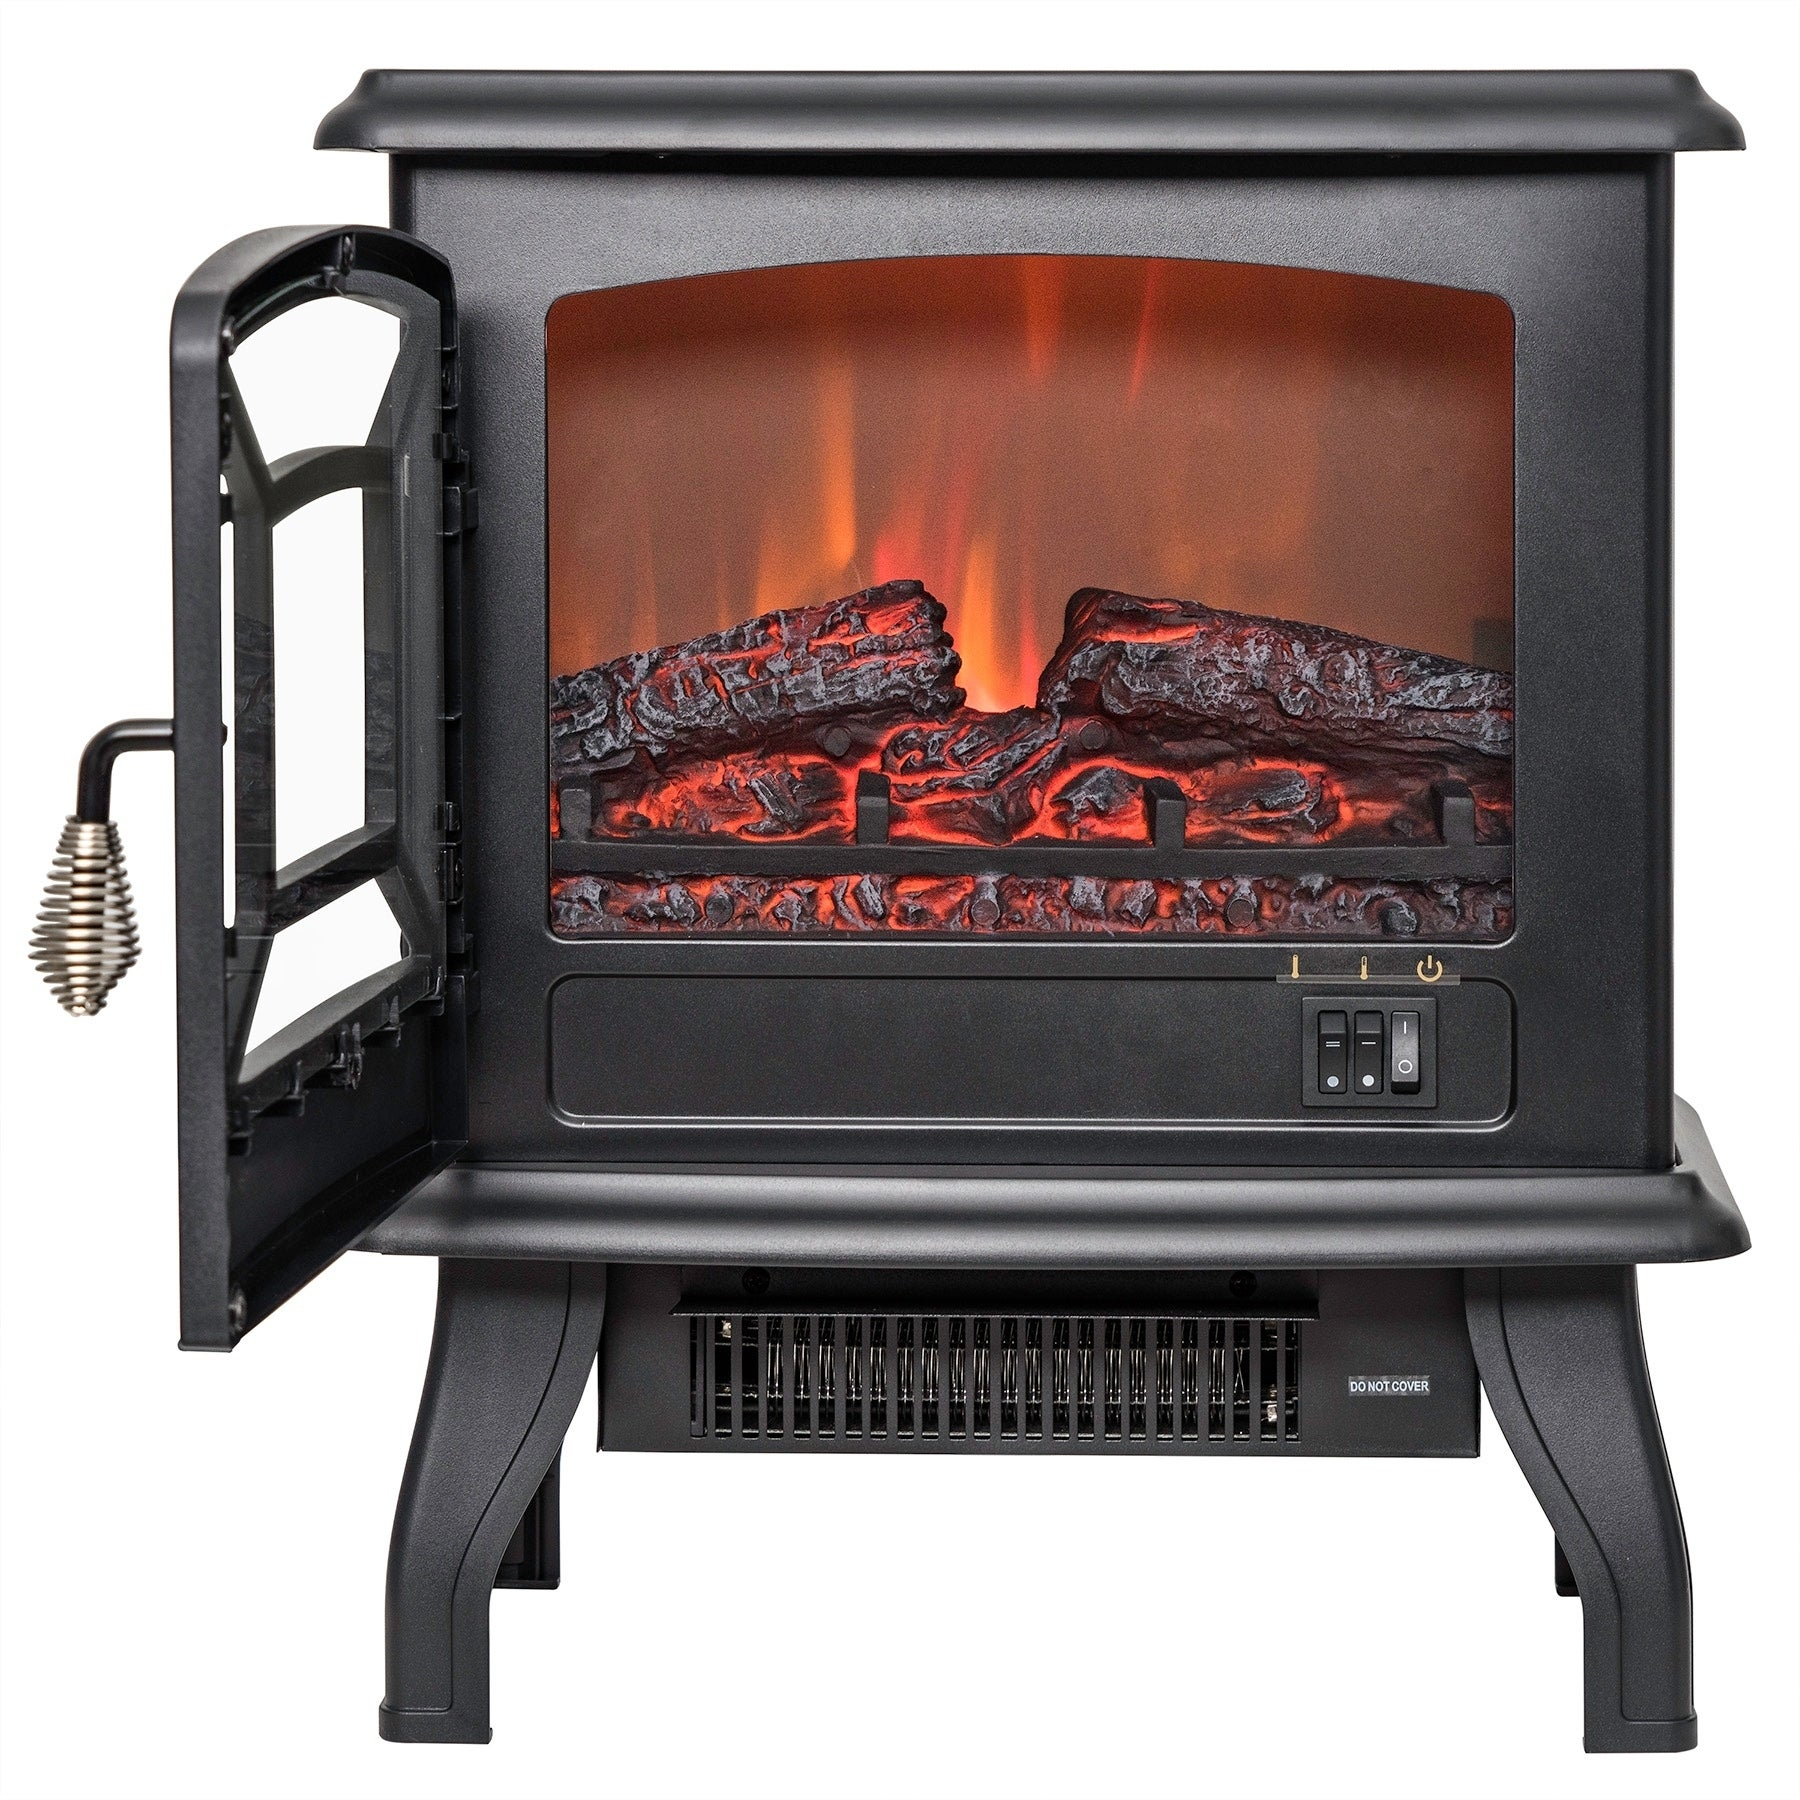 AKDY FP0078 17 Freestanding Portable Electric Fireplace 3D Flames Firebox w Logs Heater dc77dae8 f820 4899 b286 bbe353eb8030